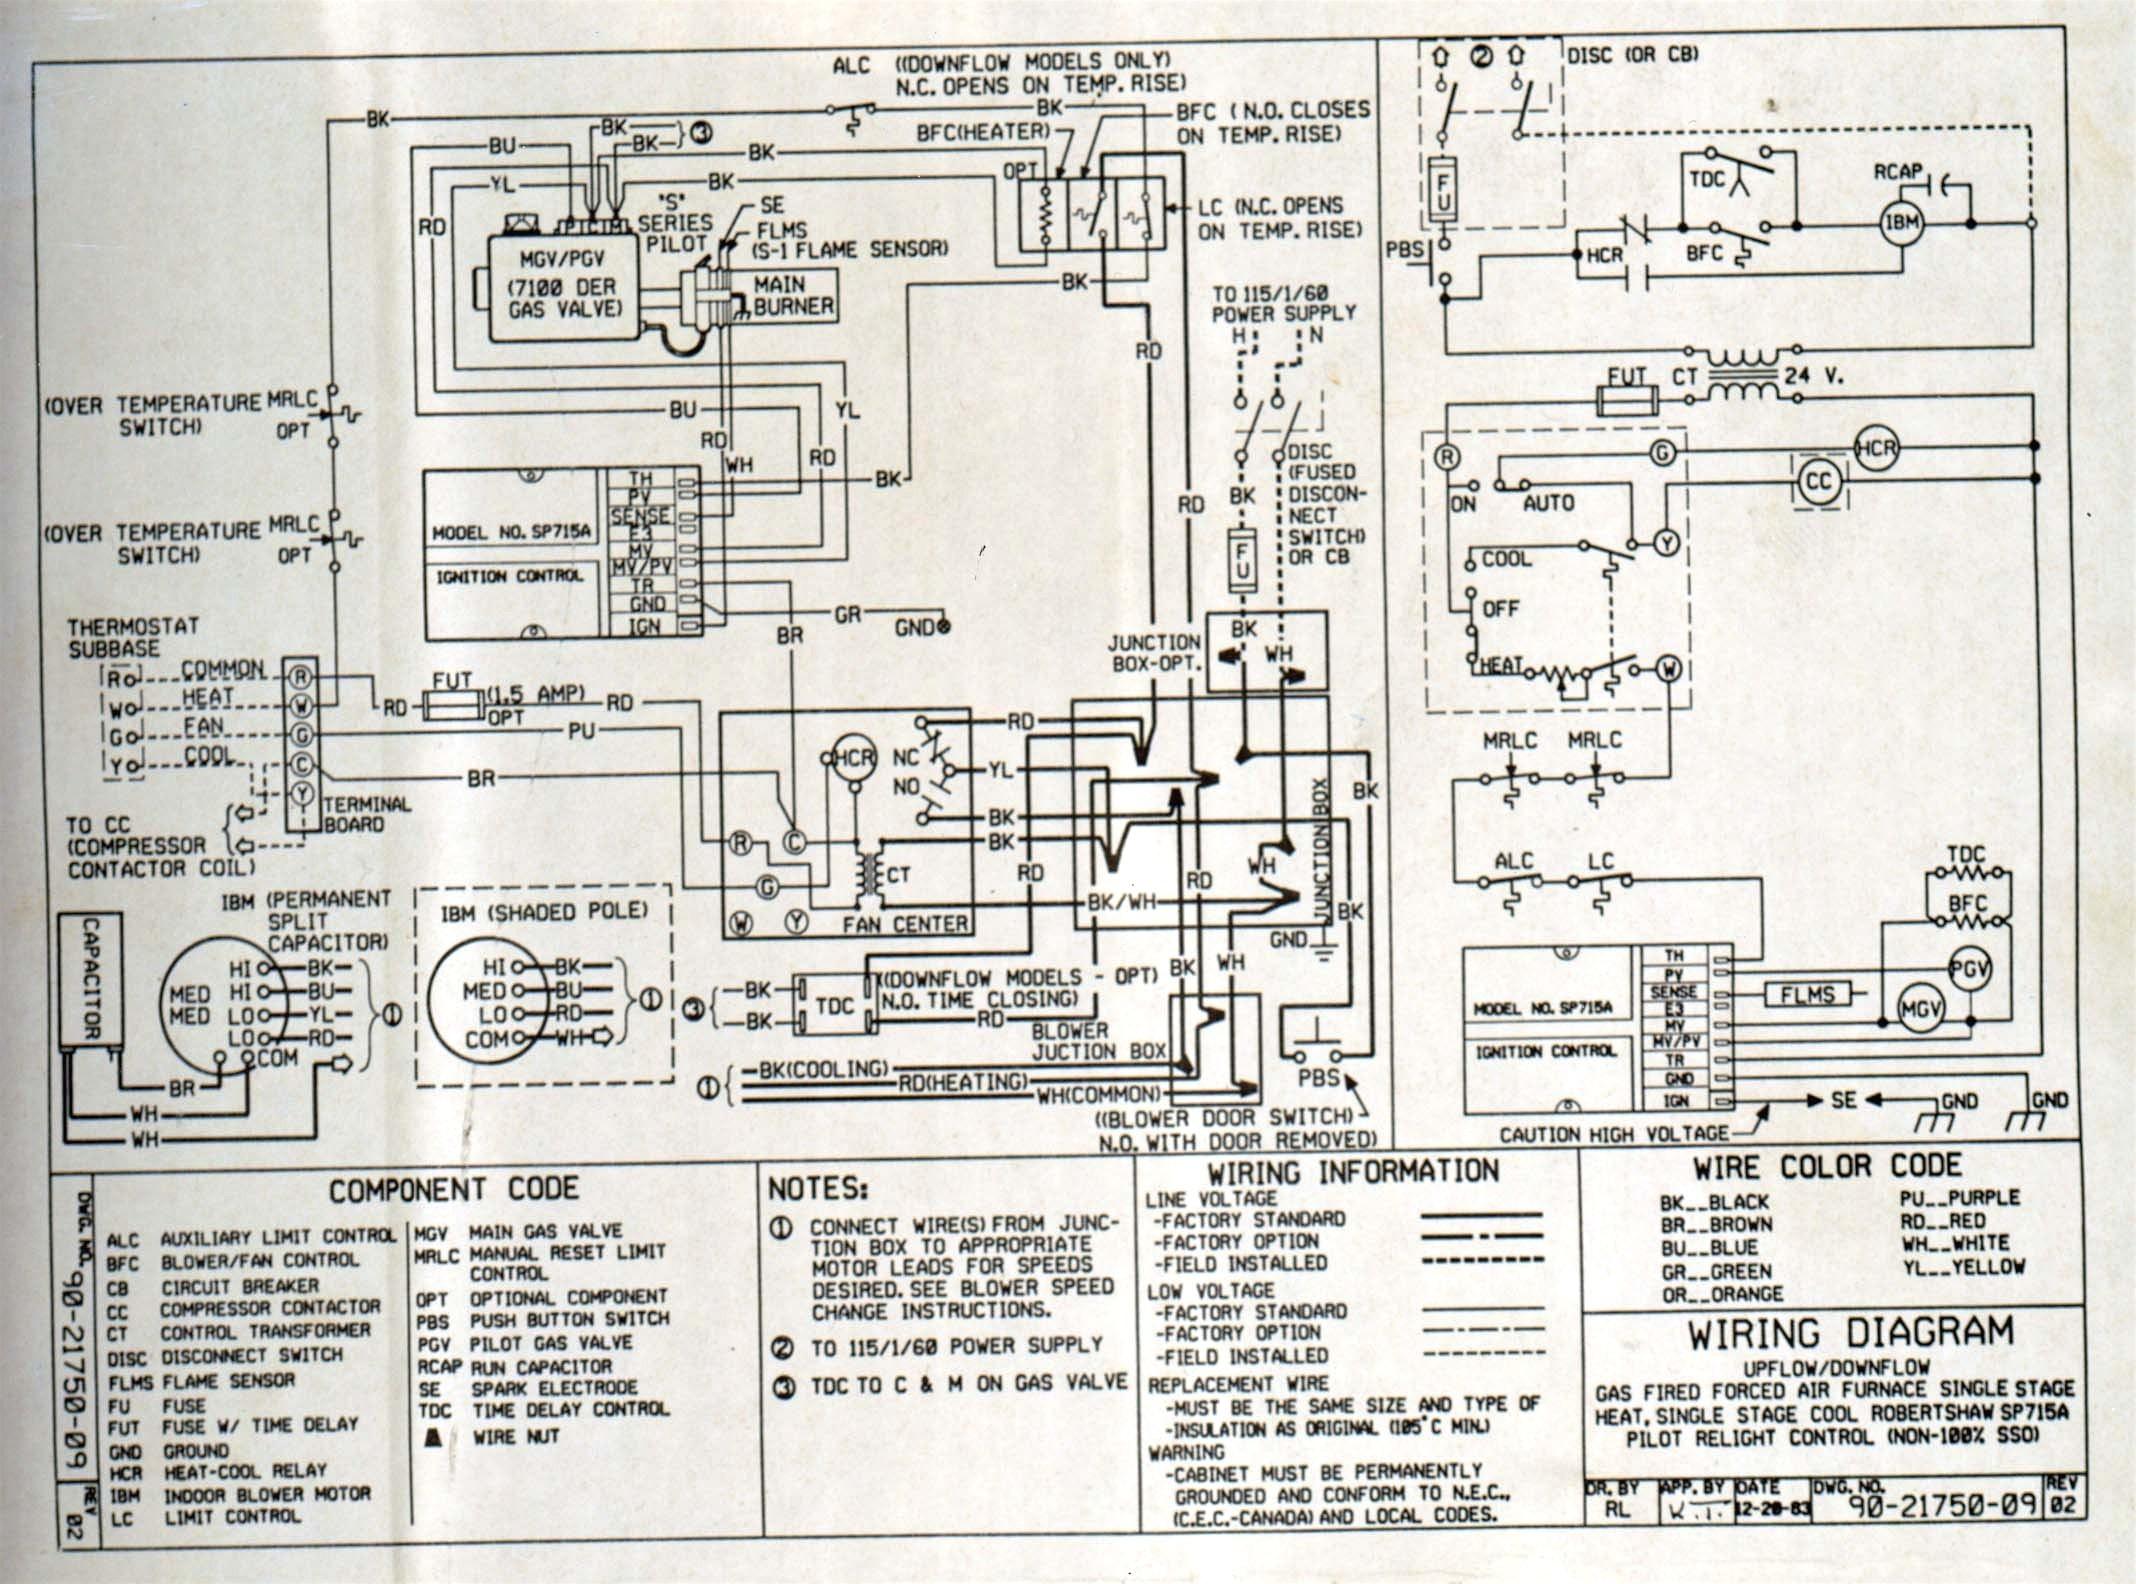 Electric Heat Wiring Diagram Heil Furnace Nug5100bhb2 Wiring Diagram Wiring Diagram Week Of Electric Heat Wiring Diagram